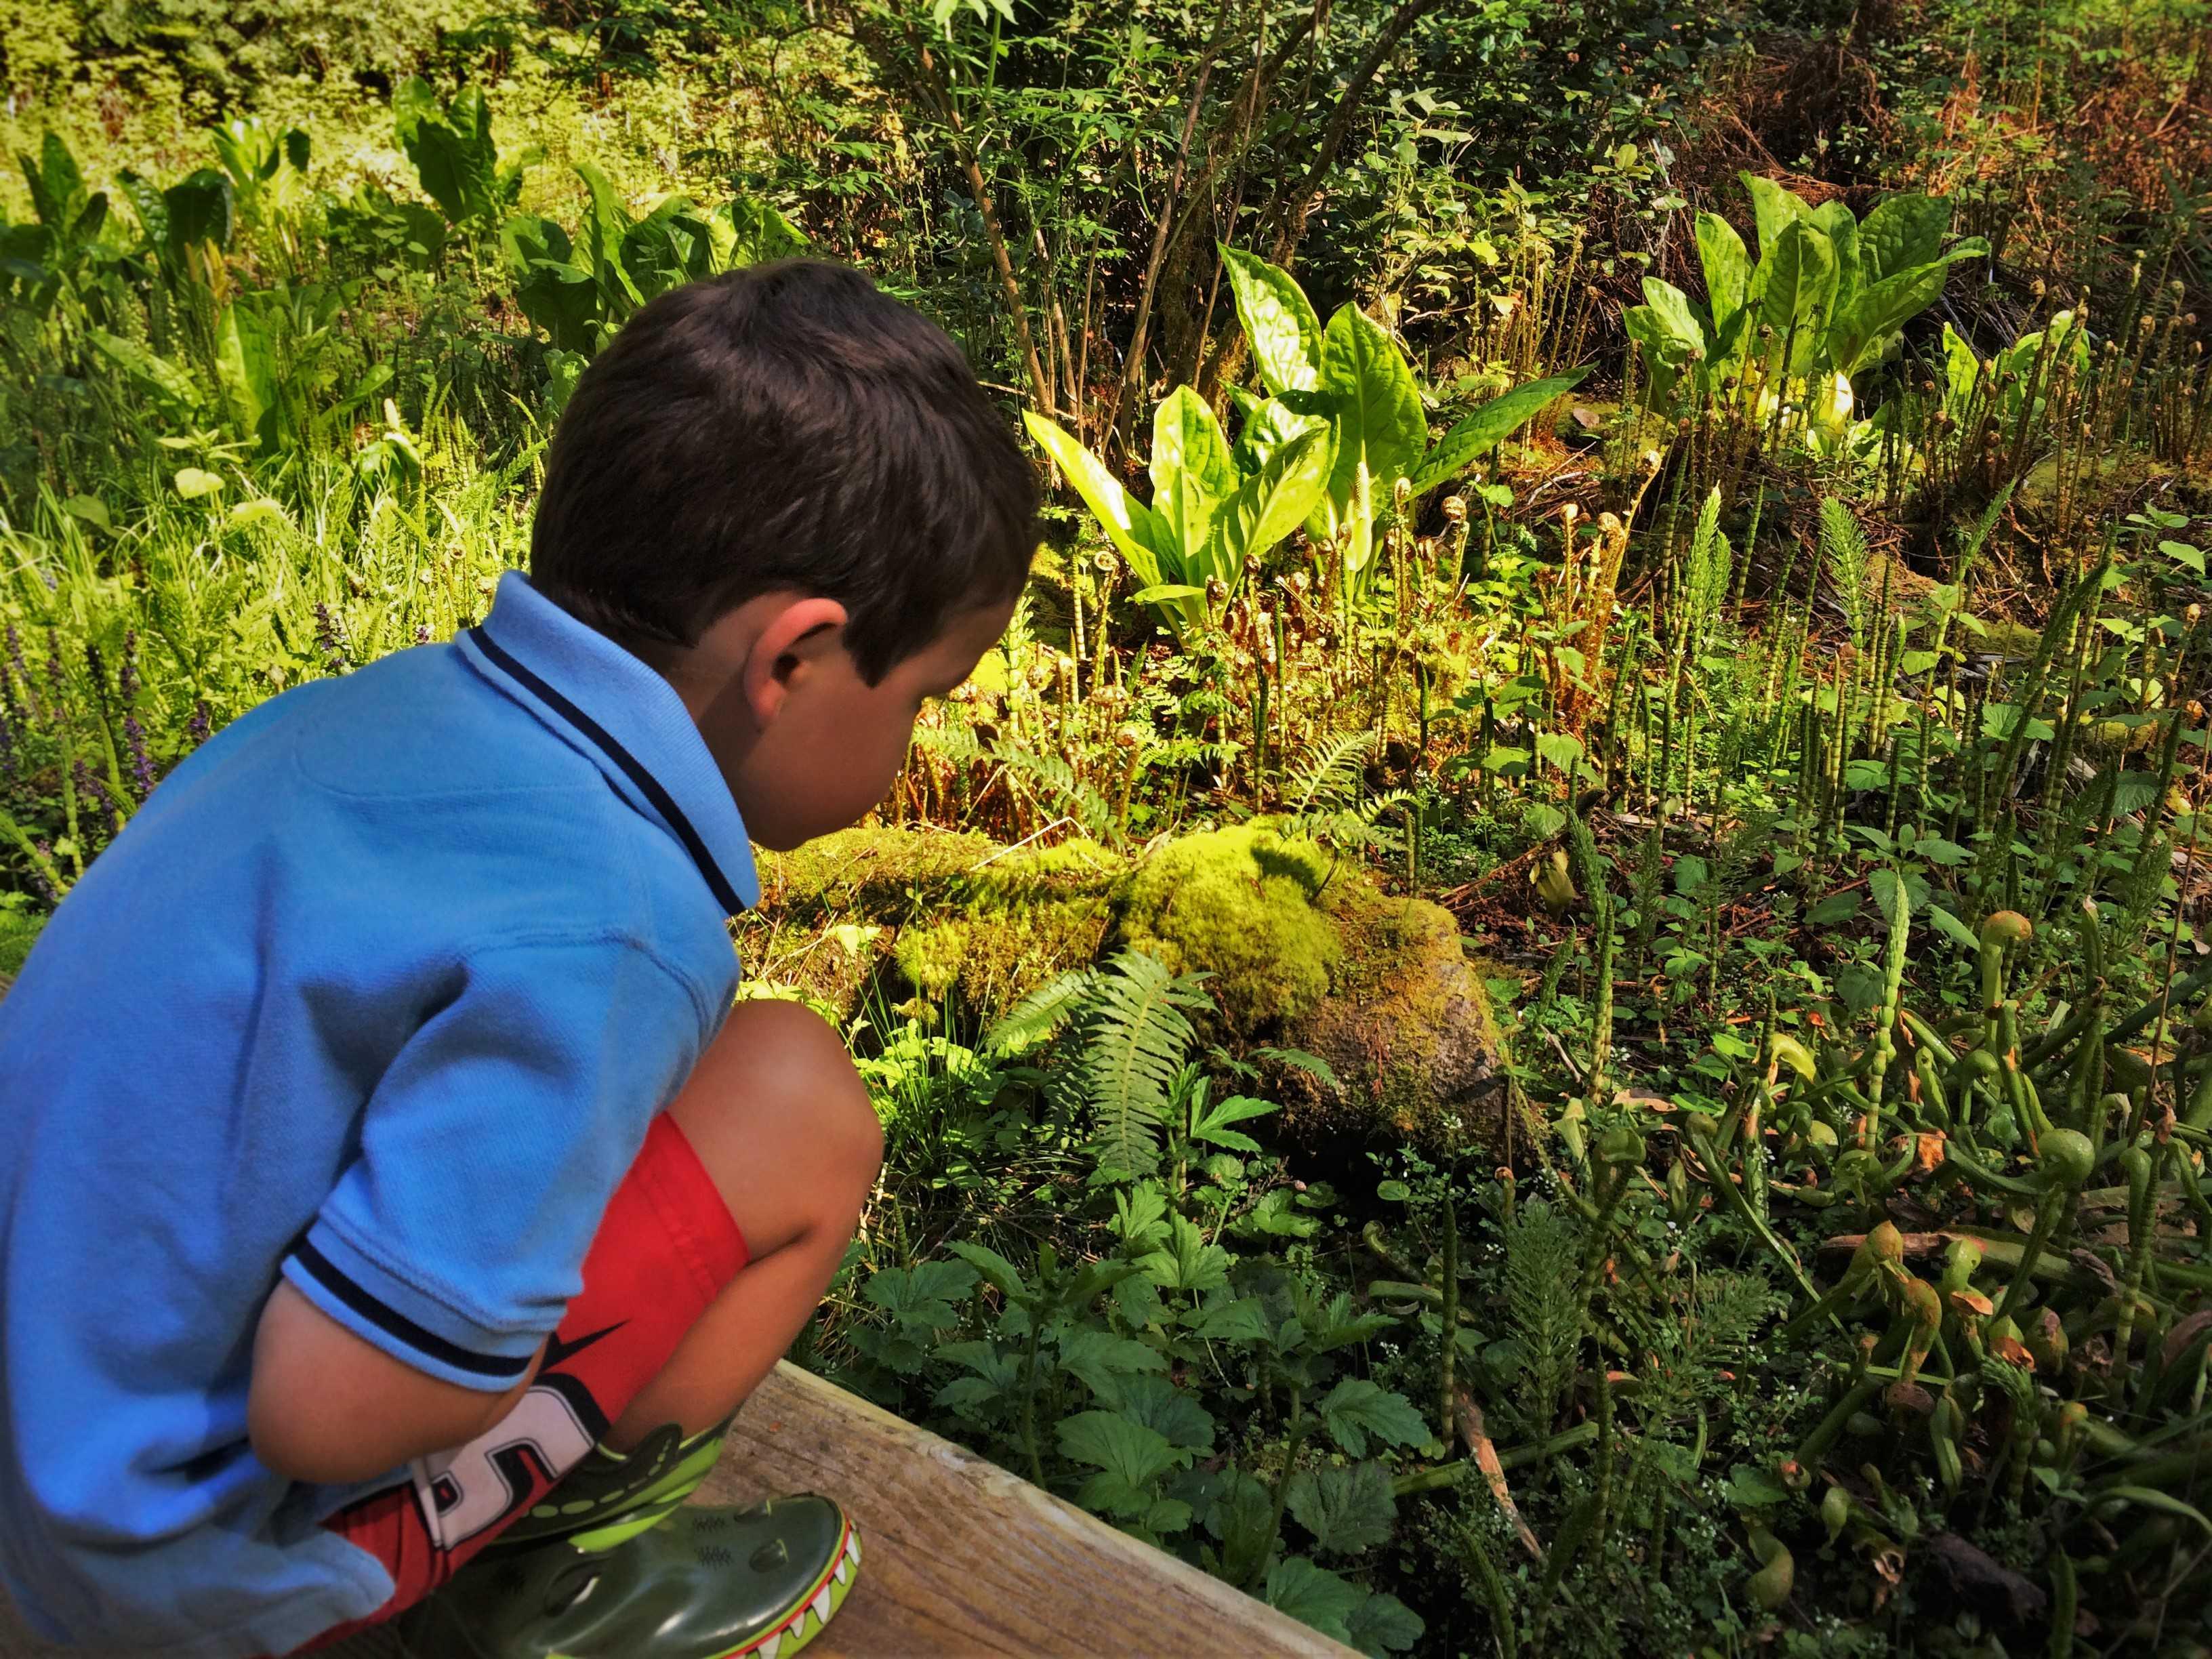 LittleMan and Pitcher Plants at Bloedel Reserve Bainbridge Island 1